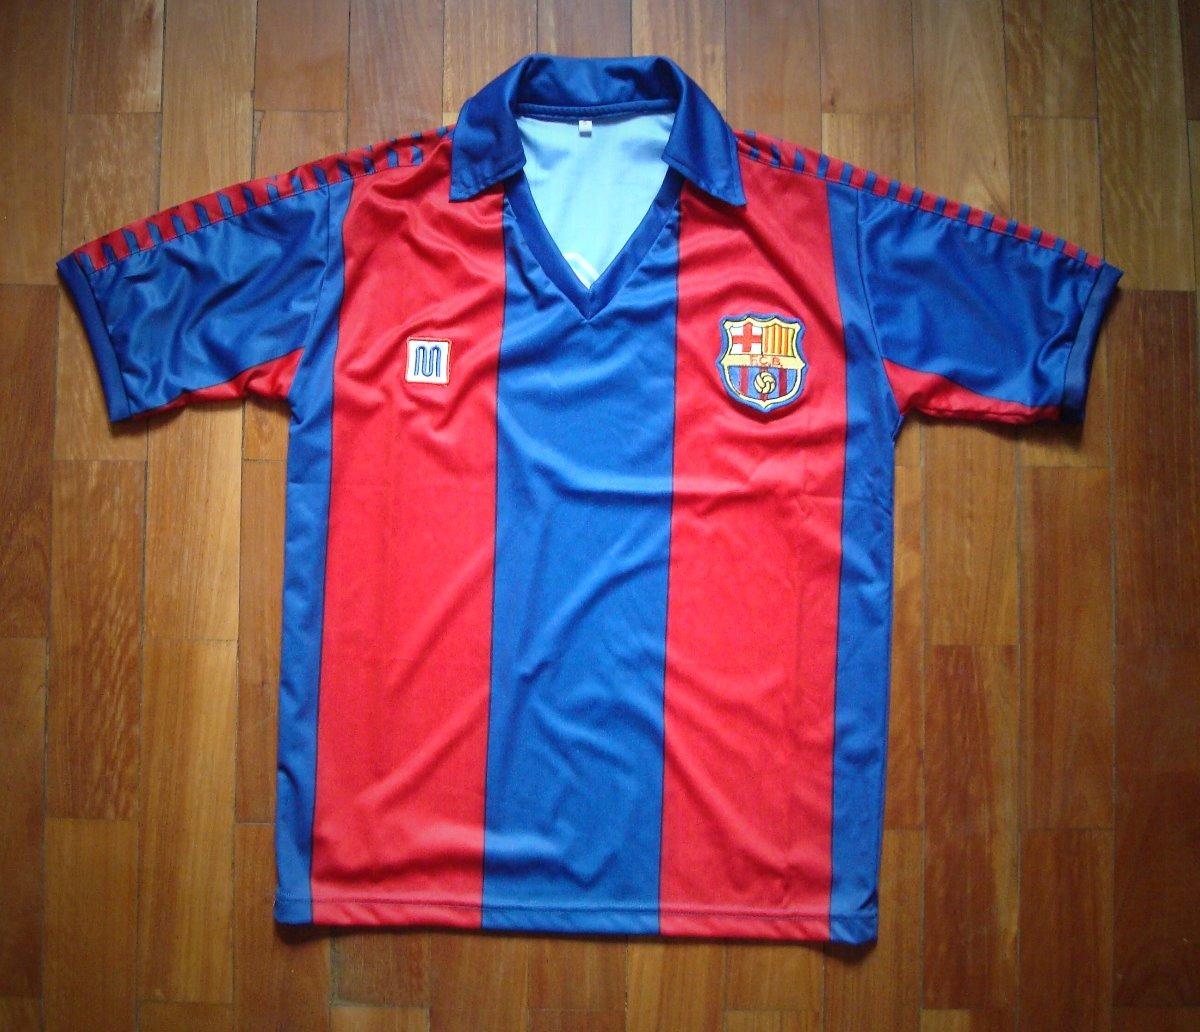 deccc9a1d camiseta retro barça 1982 barcelona diego maradona 82. Cargando zoom.